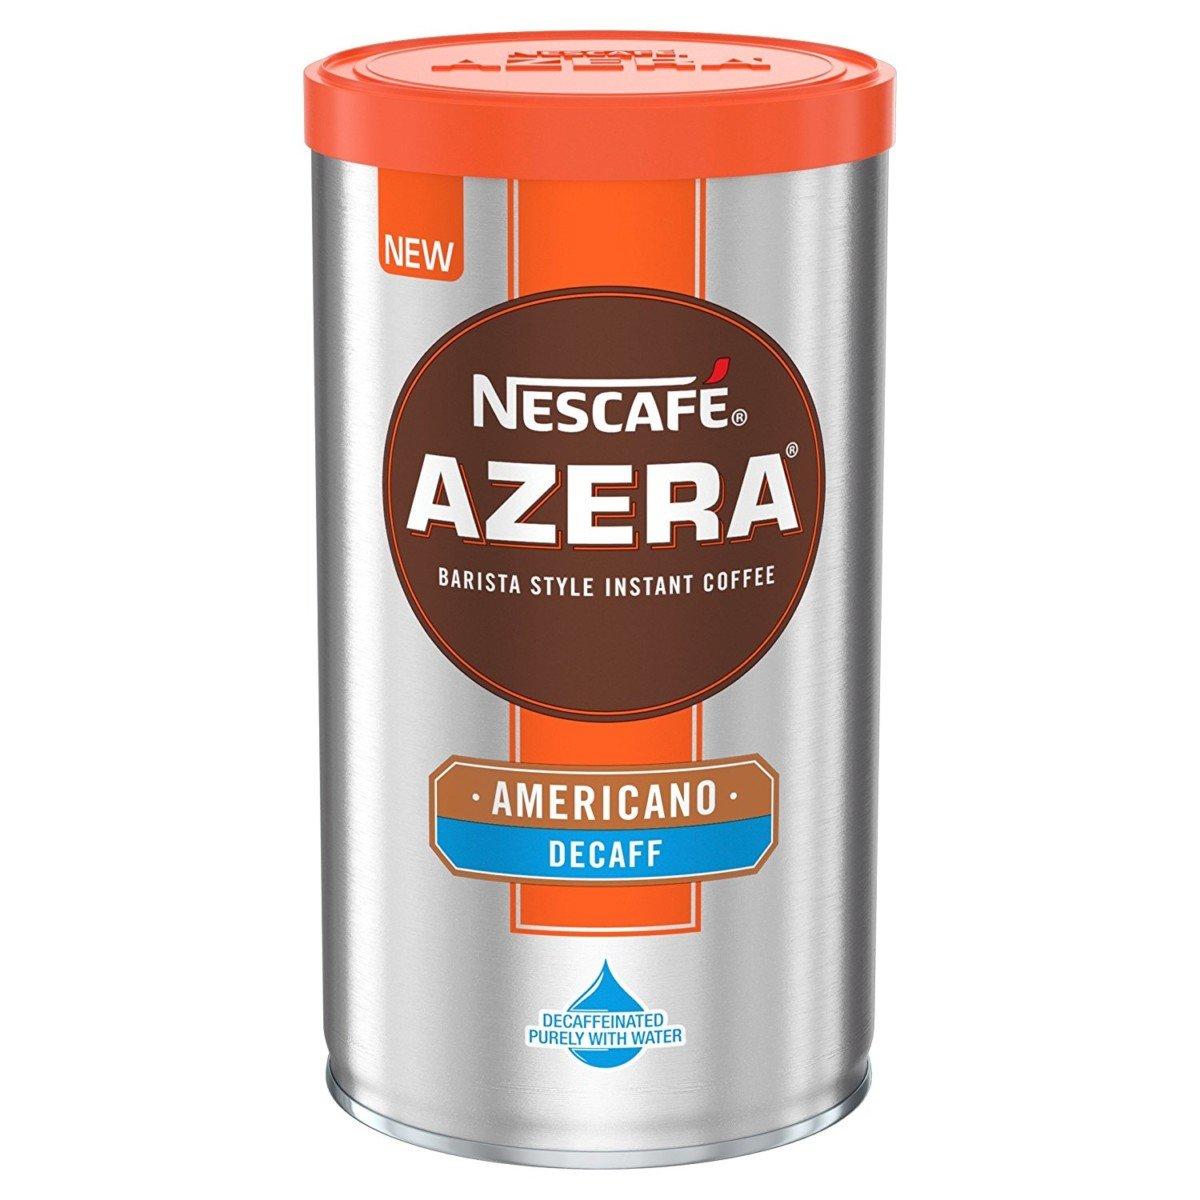 Nescafe Azera Americano Decaffeinated Decaf Instant Coffee 100g